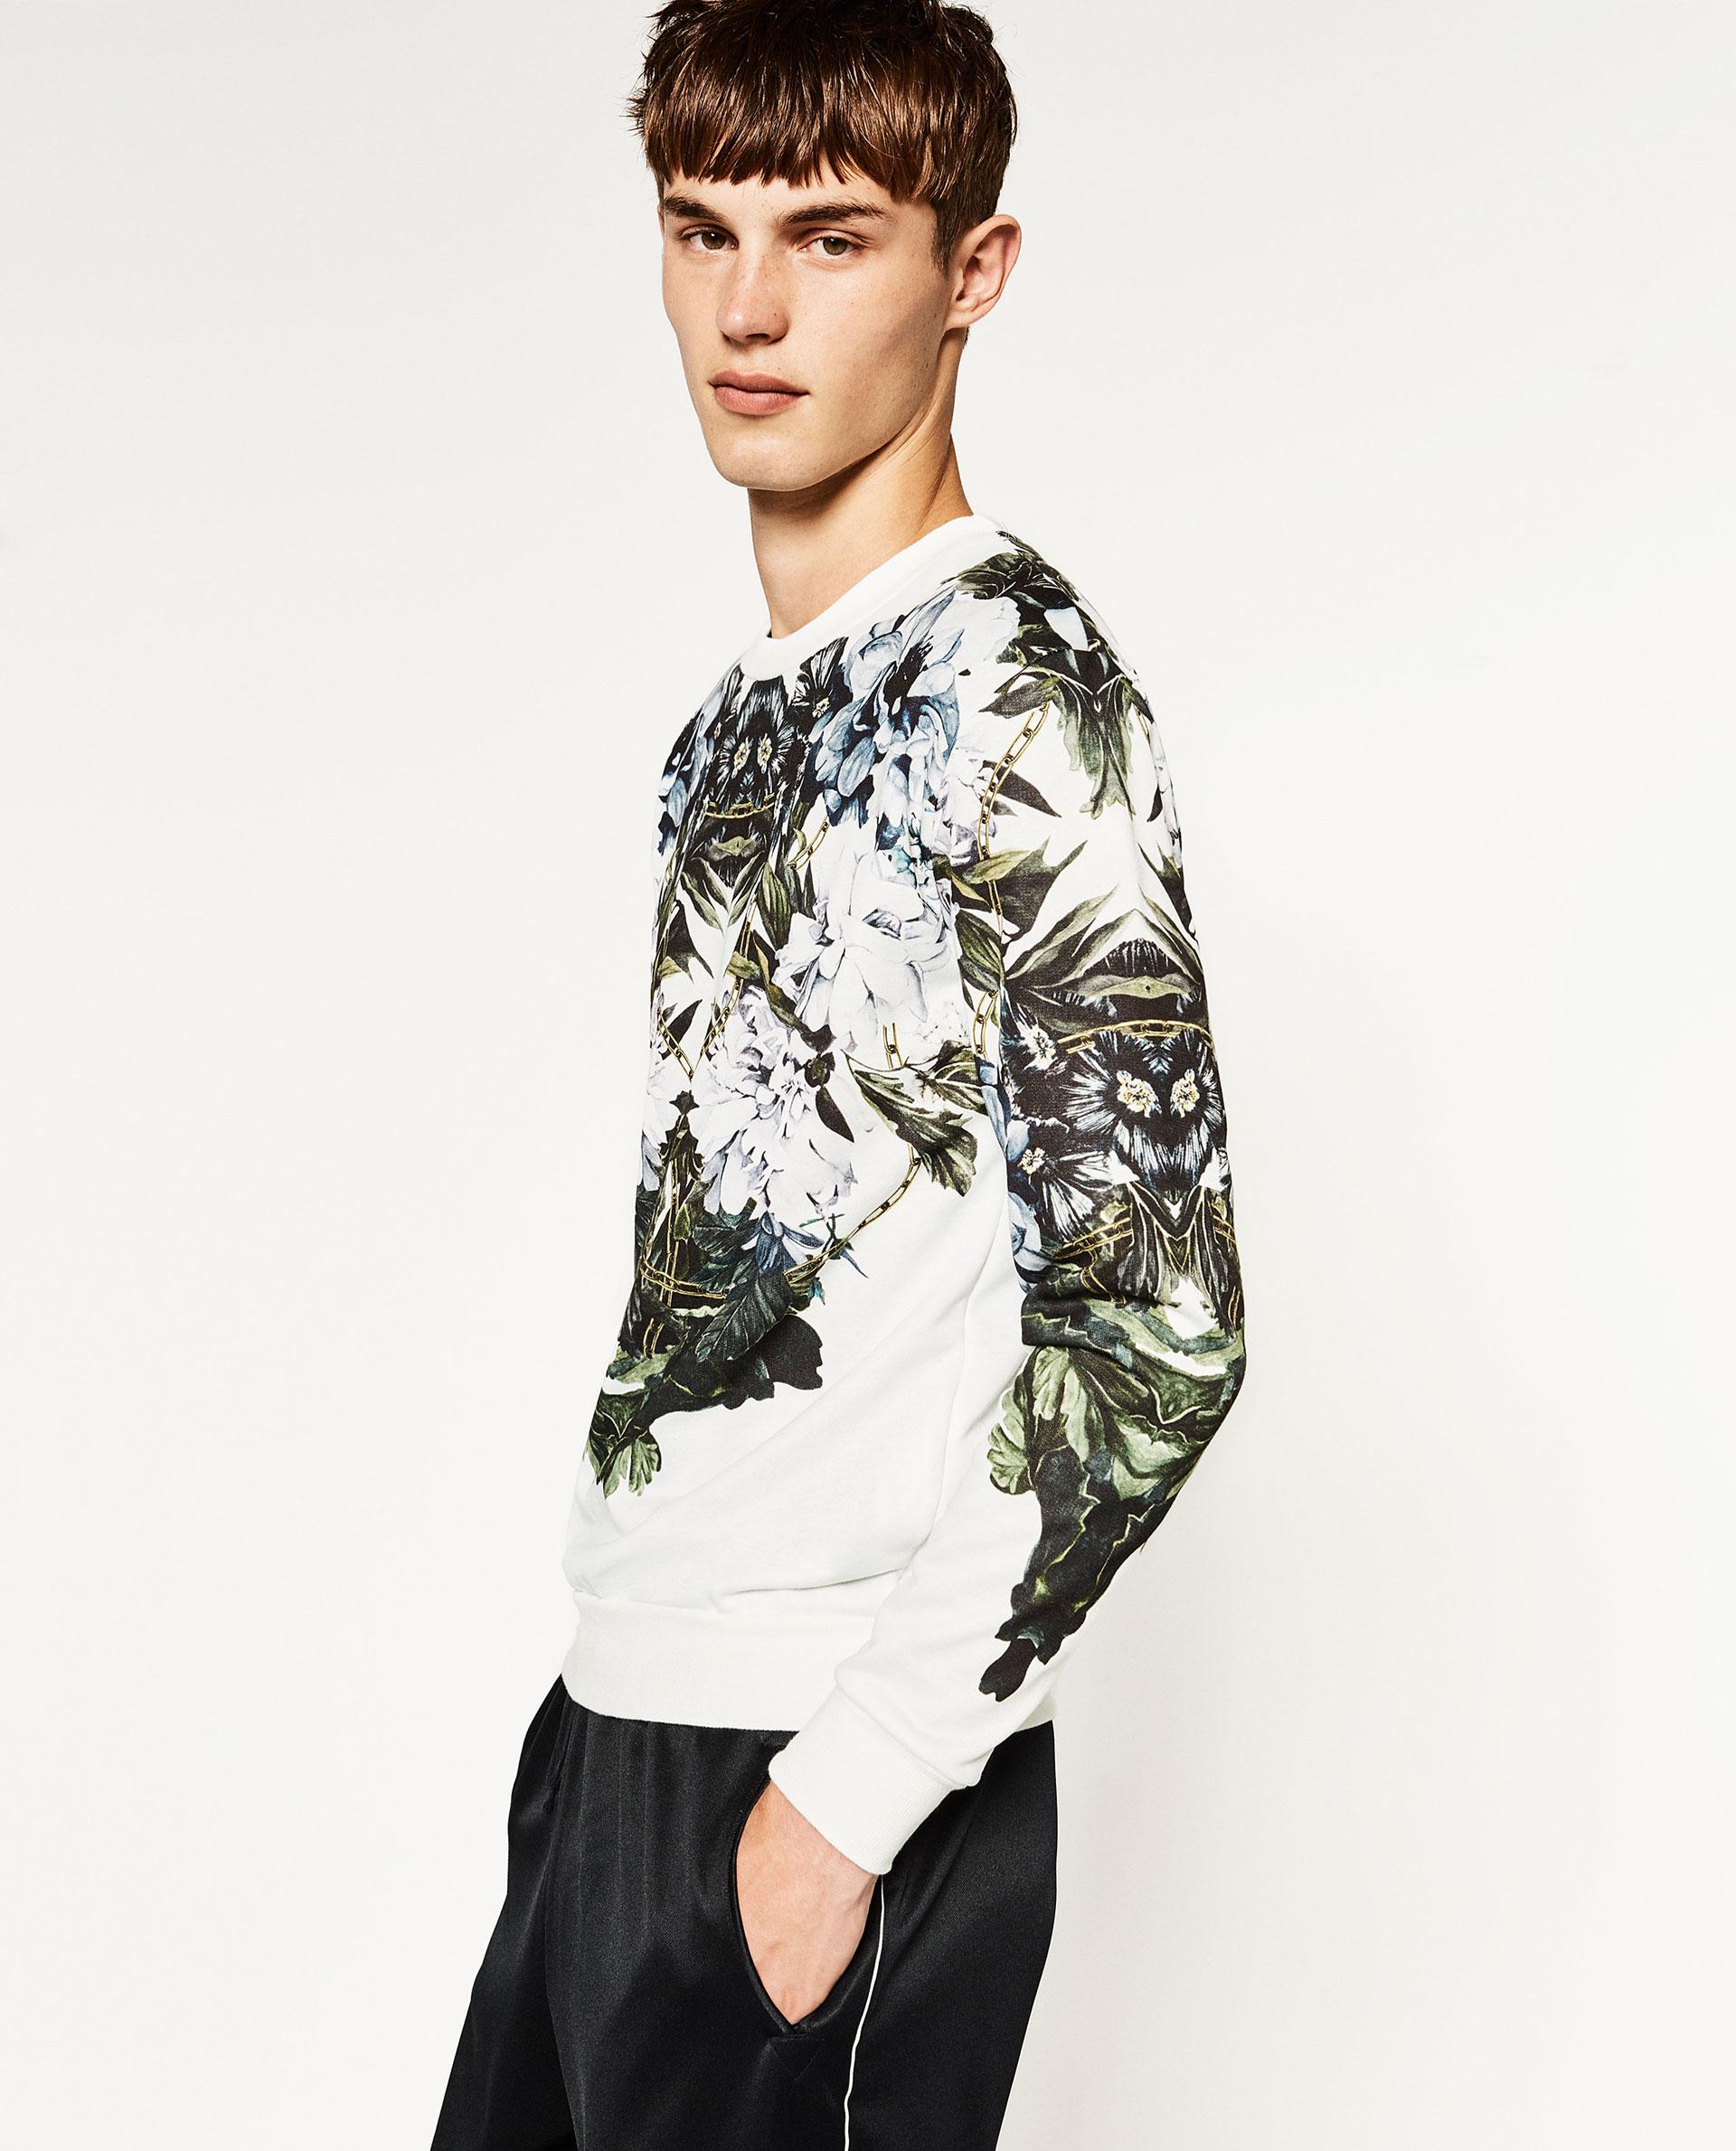 Zara floral sweatshirt for men lyst for Zara mens floral shirt